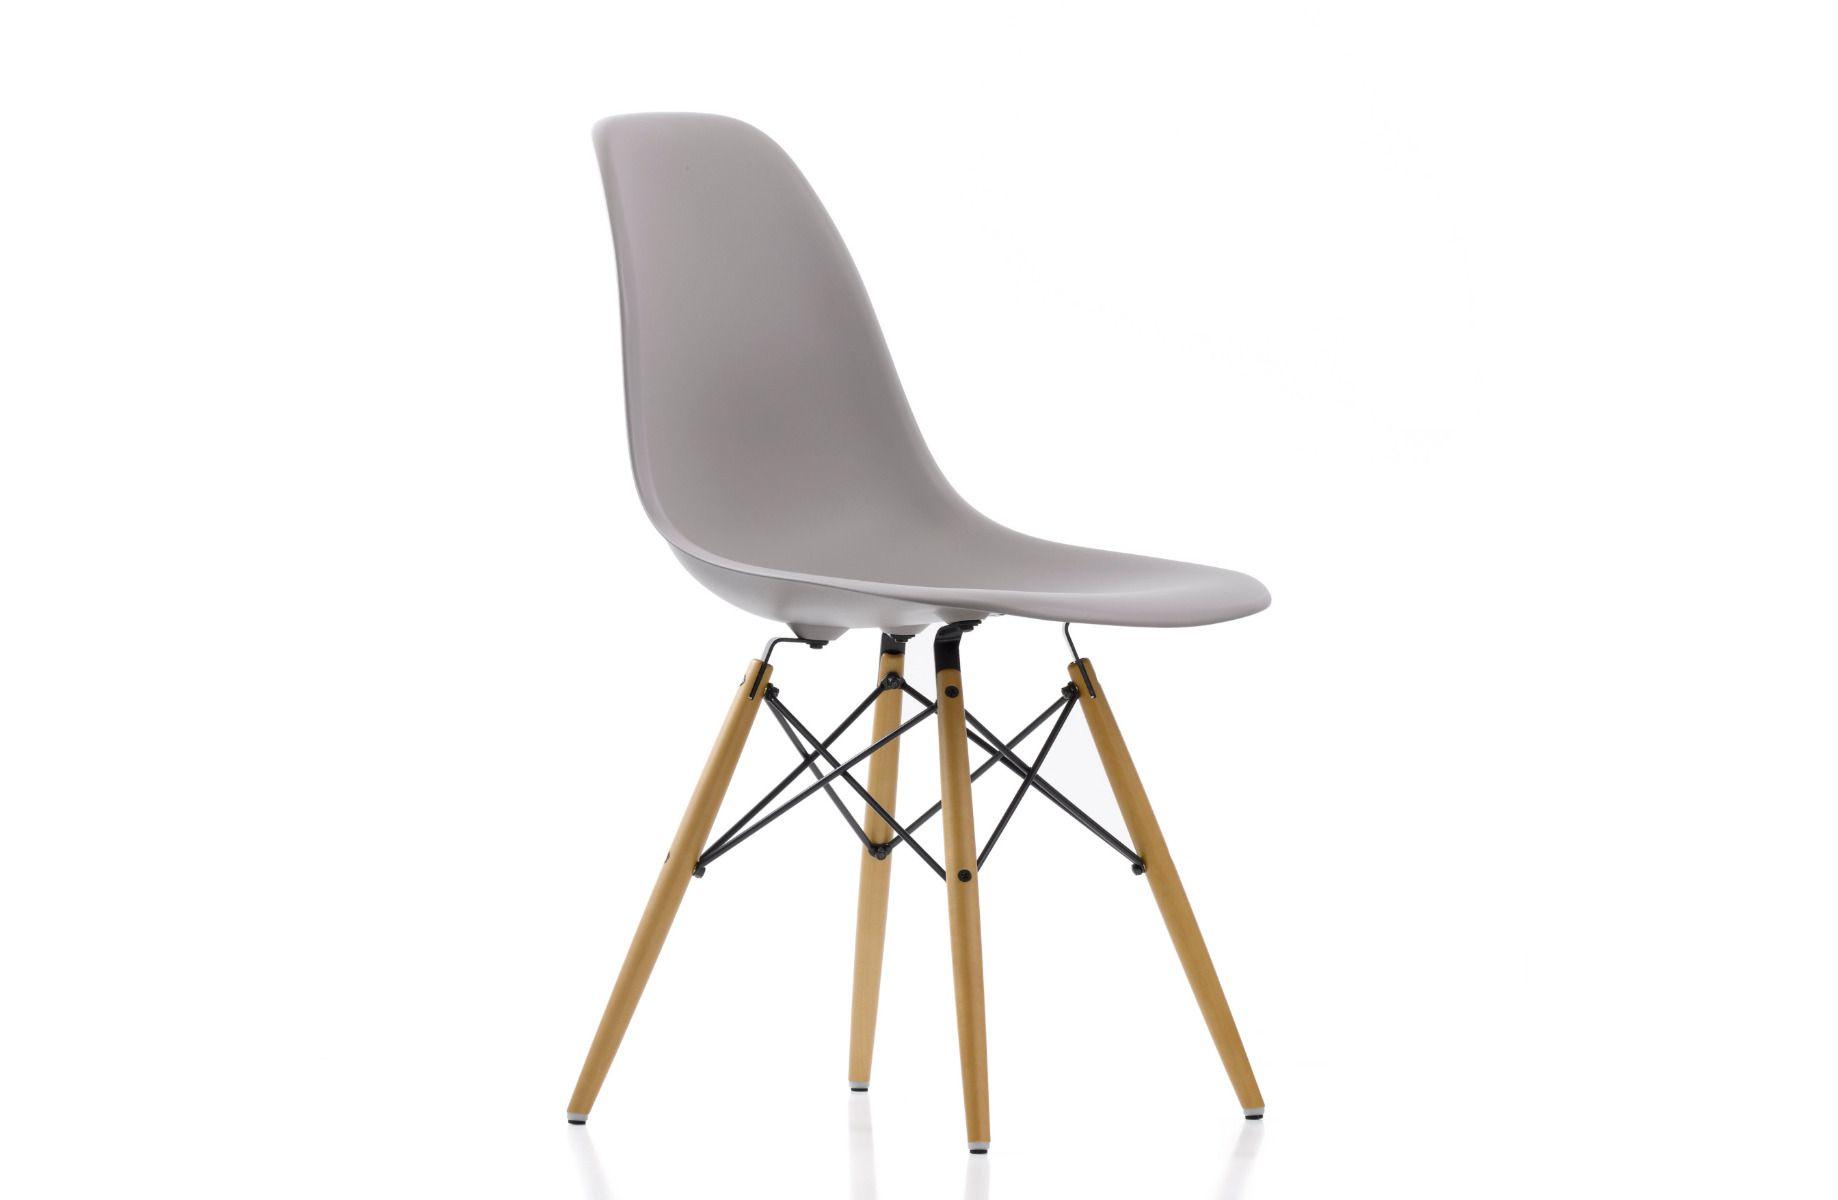 Eames Plastic Armchair : Vitra eames plastic side chair dsw bei schlafsofa shop